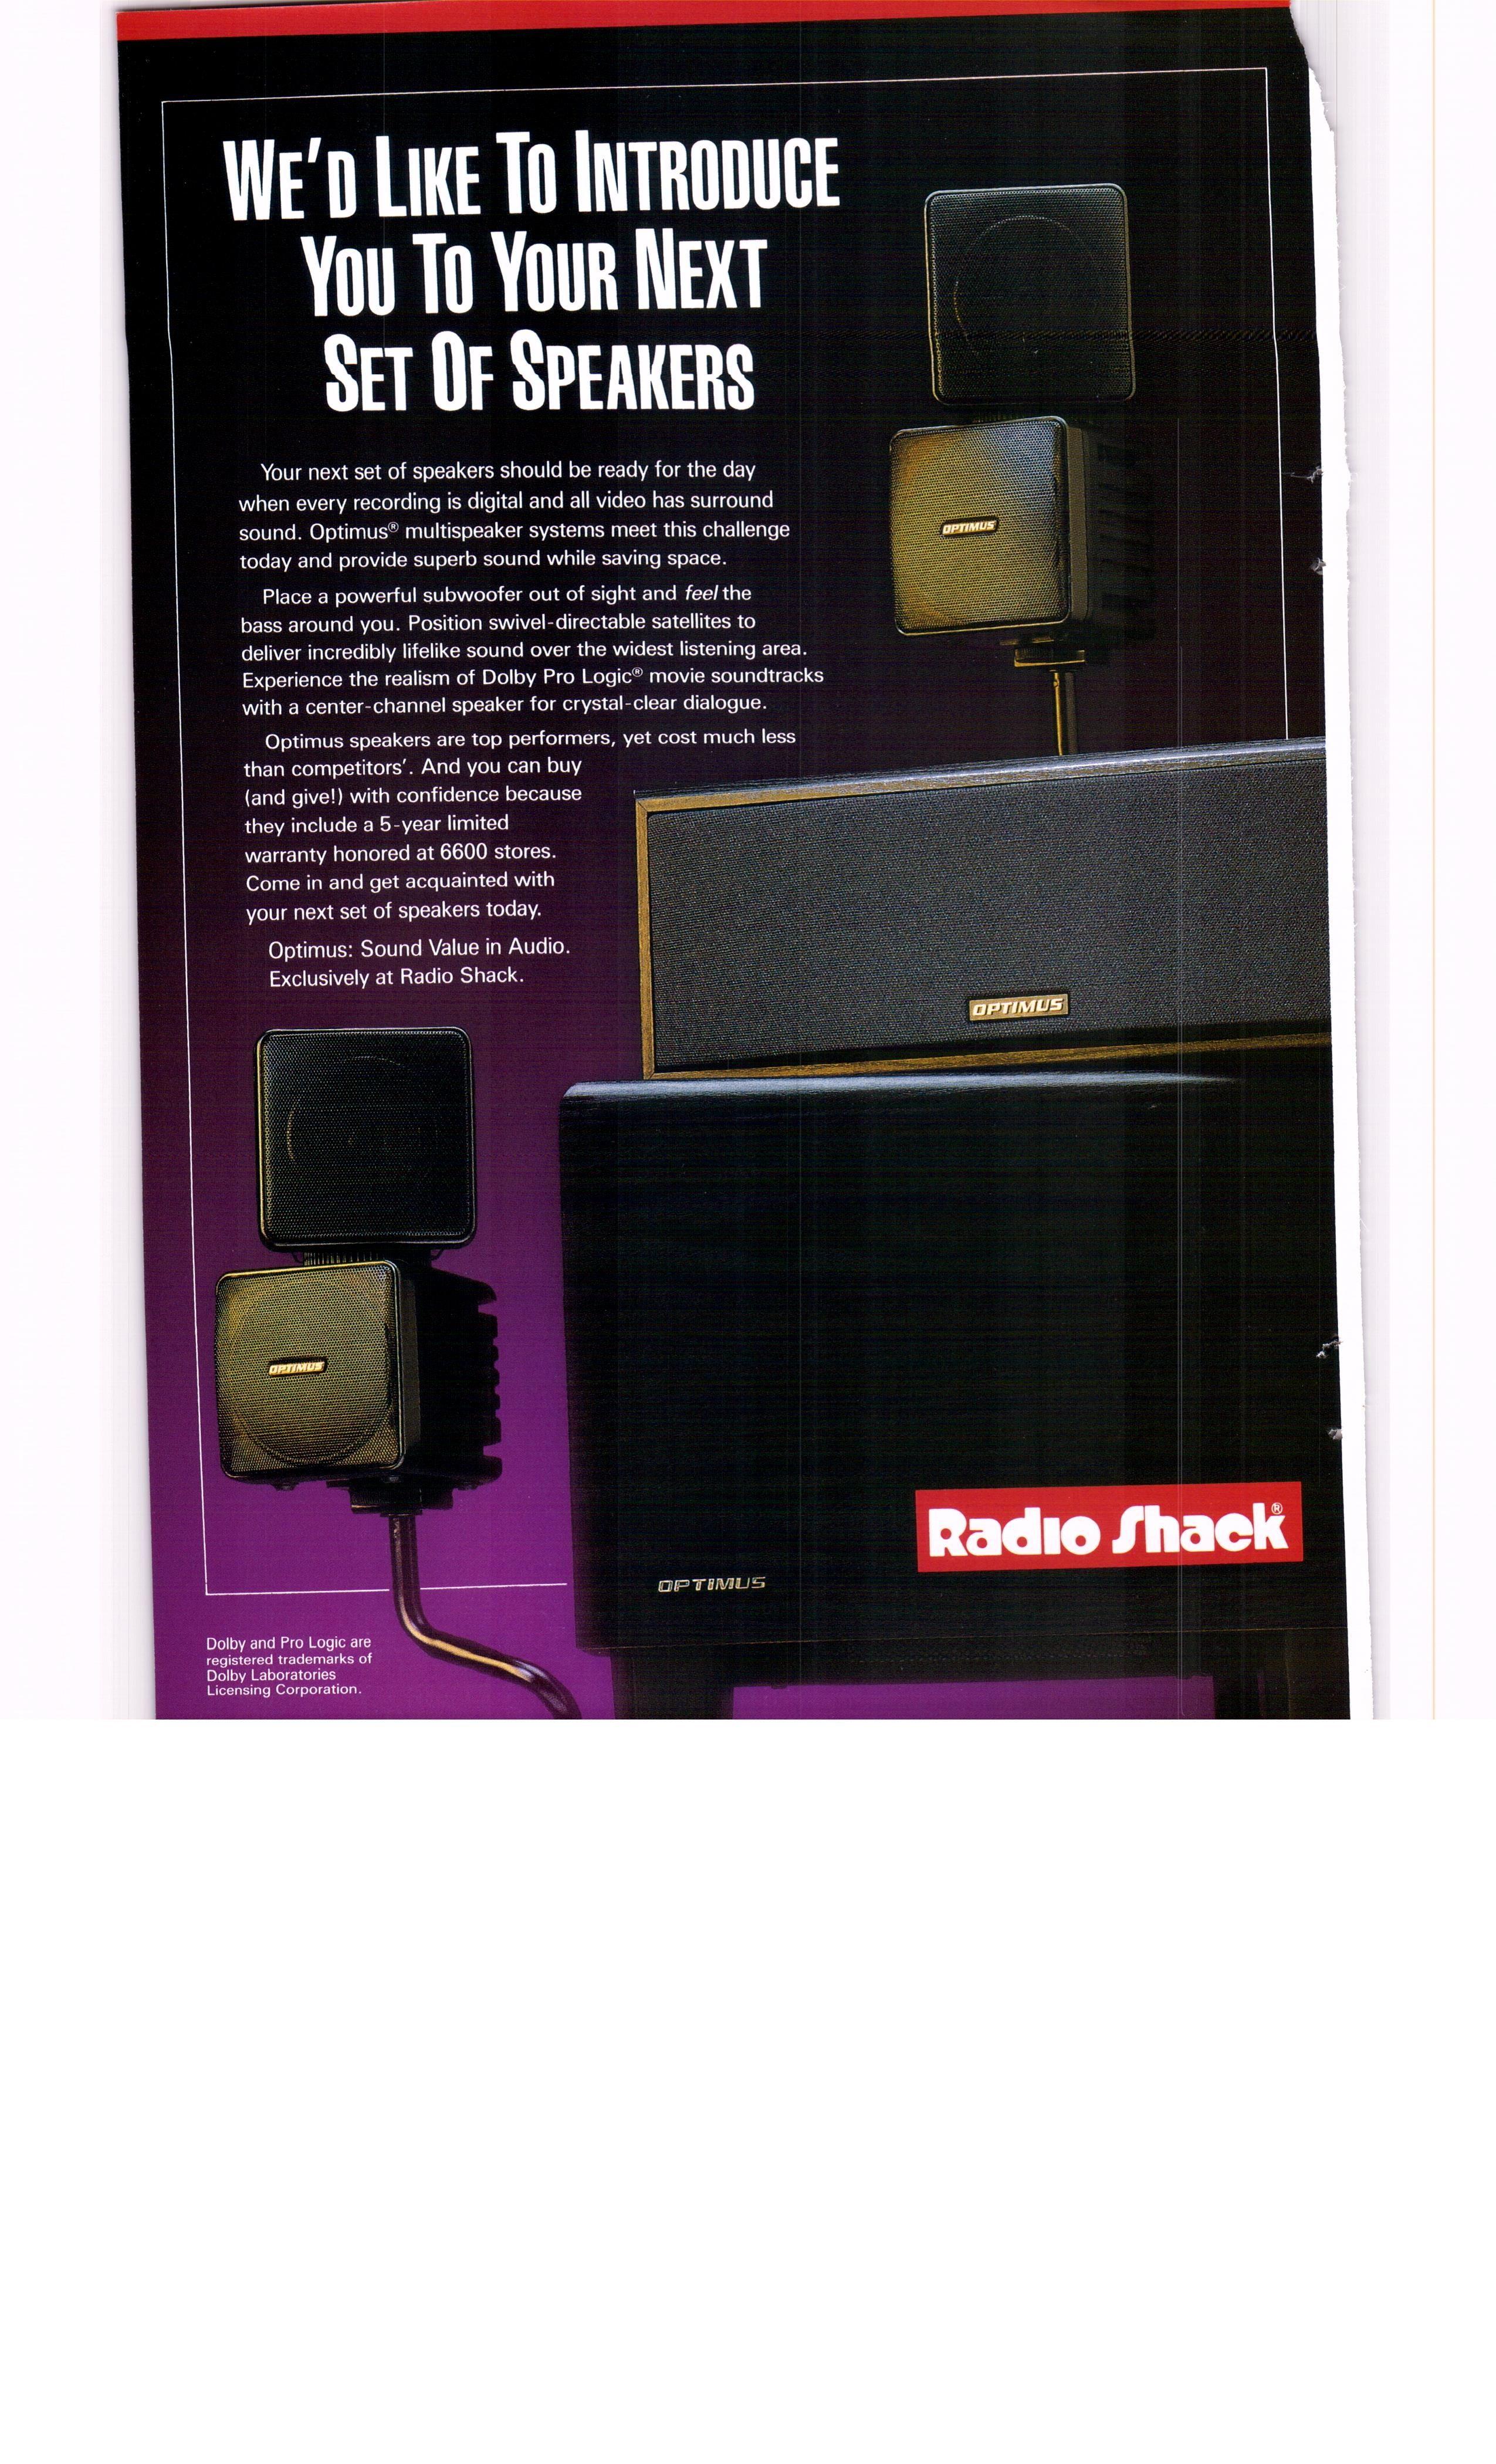 speakers radio shack. 1994 radio shack optimus home stereo speakers - national geographic december 1993